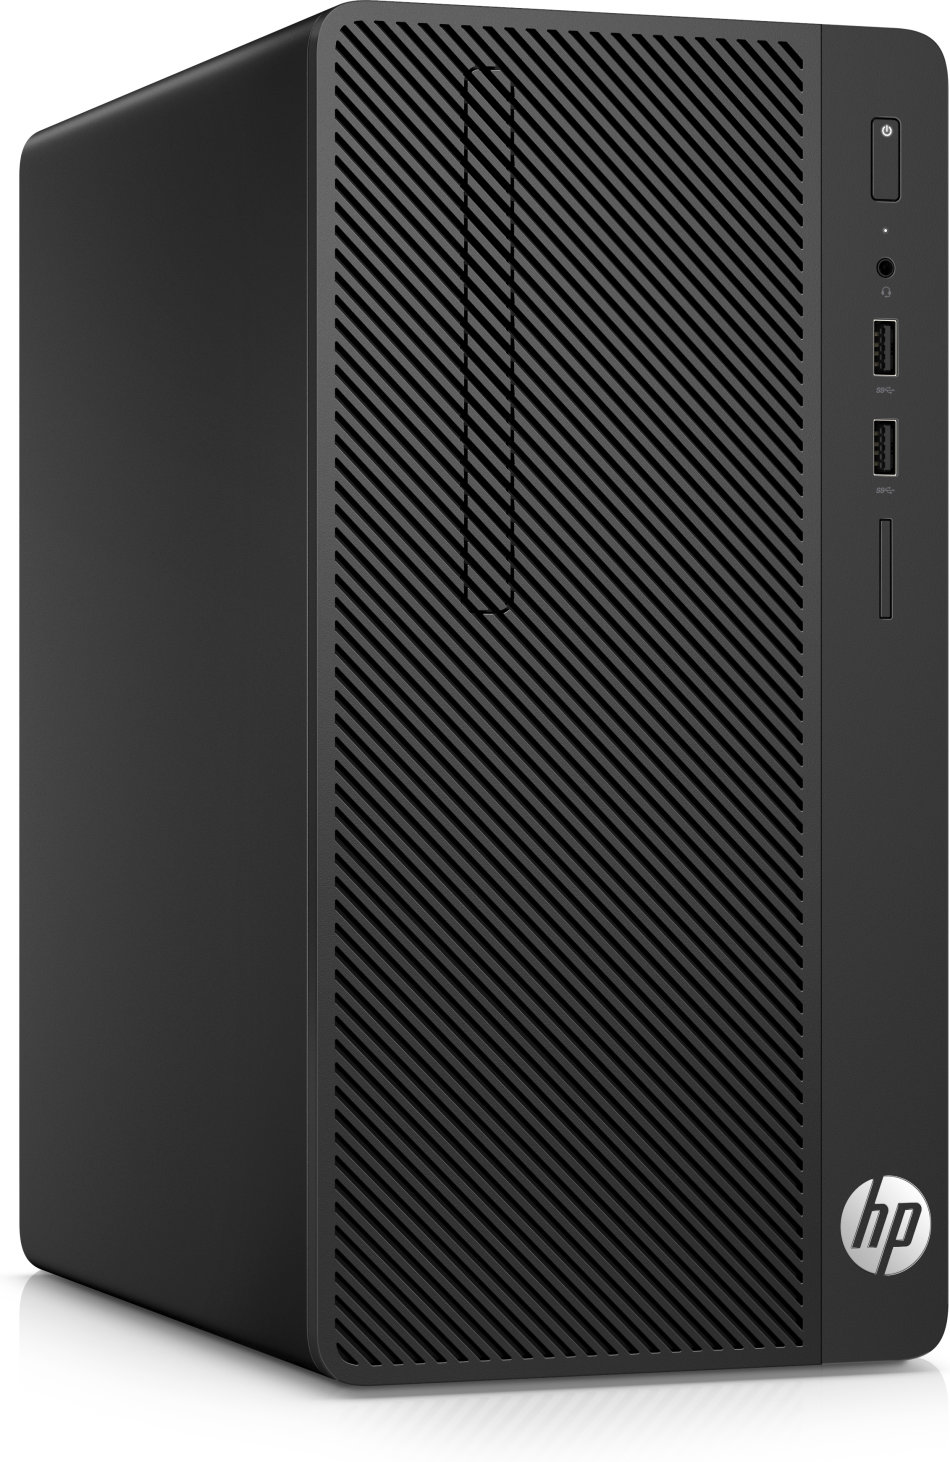 HP 290 G1 Micro Tower PC